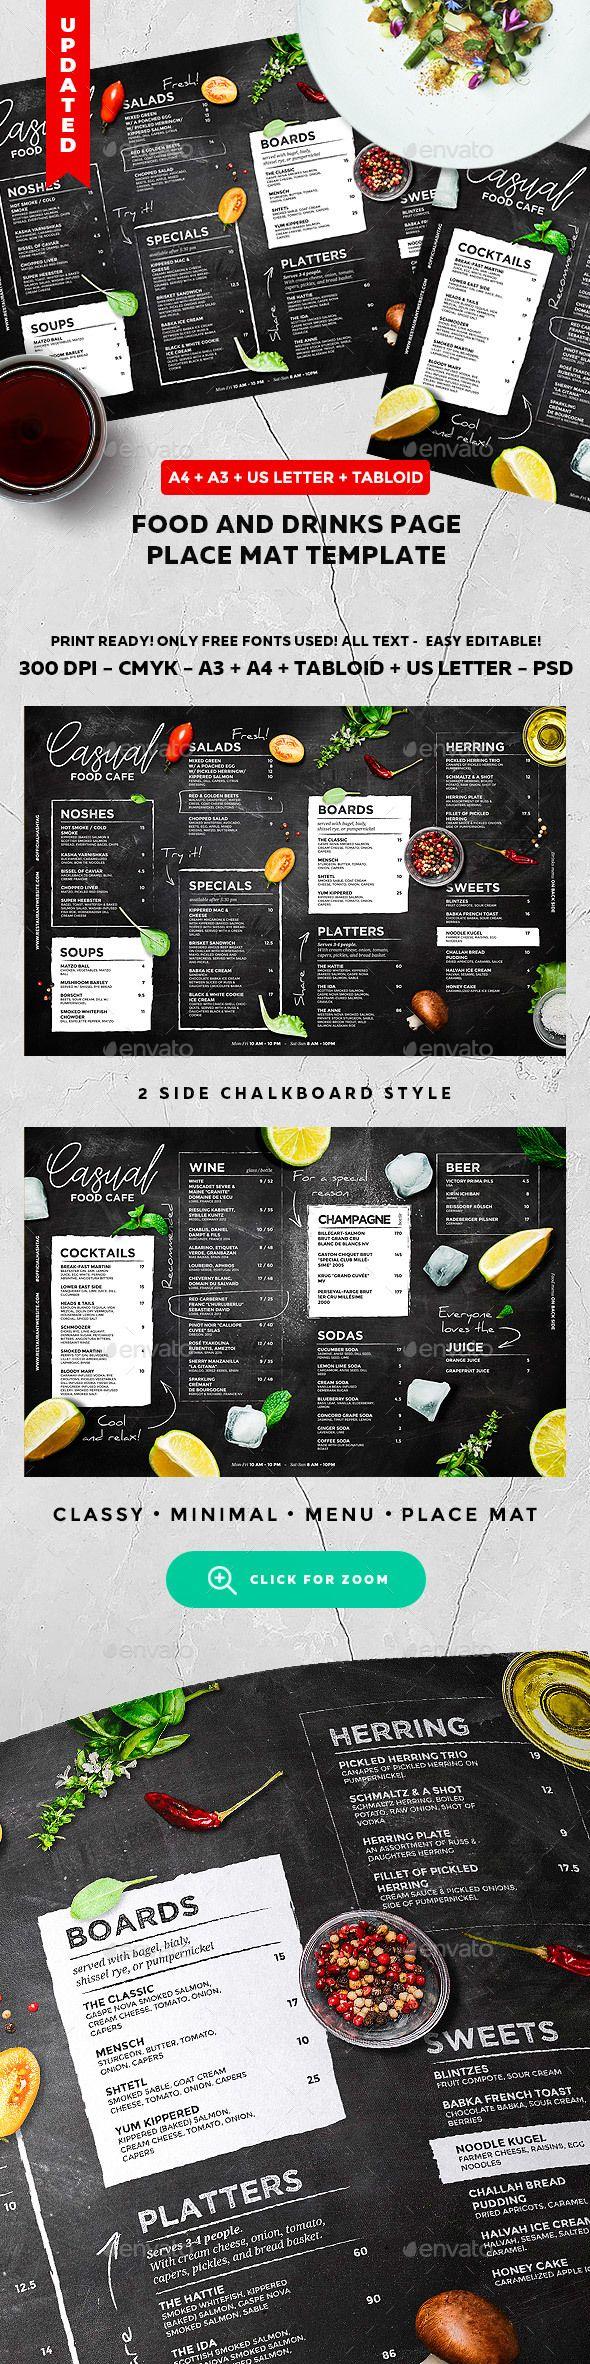 menu template free free online menu templates free menu templates